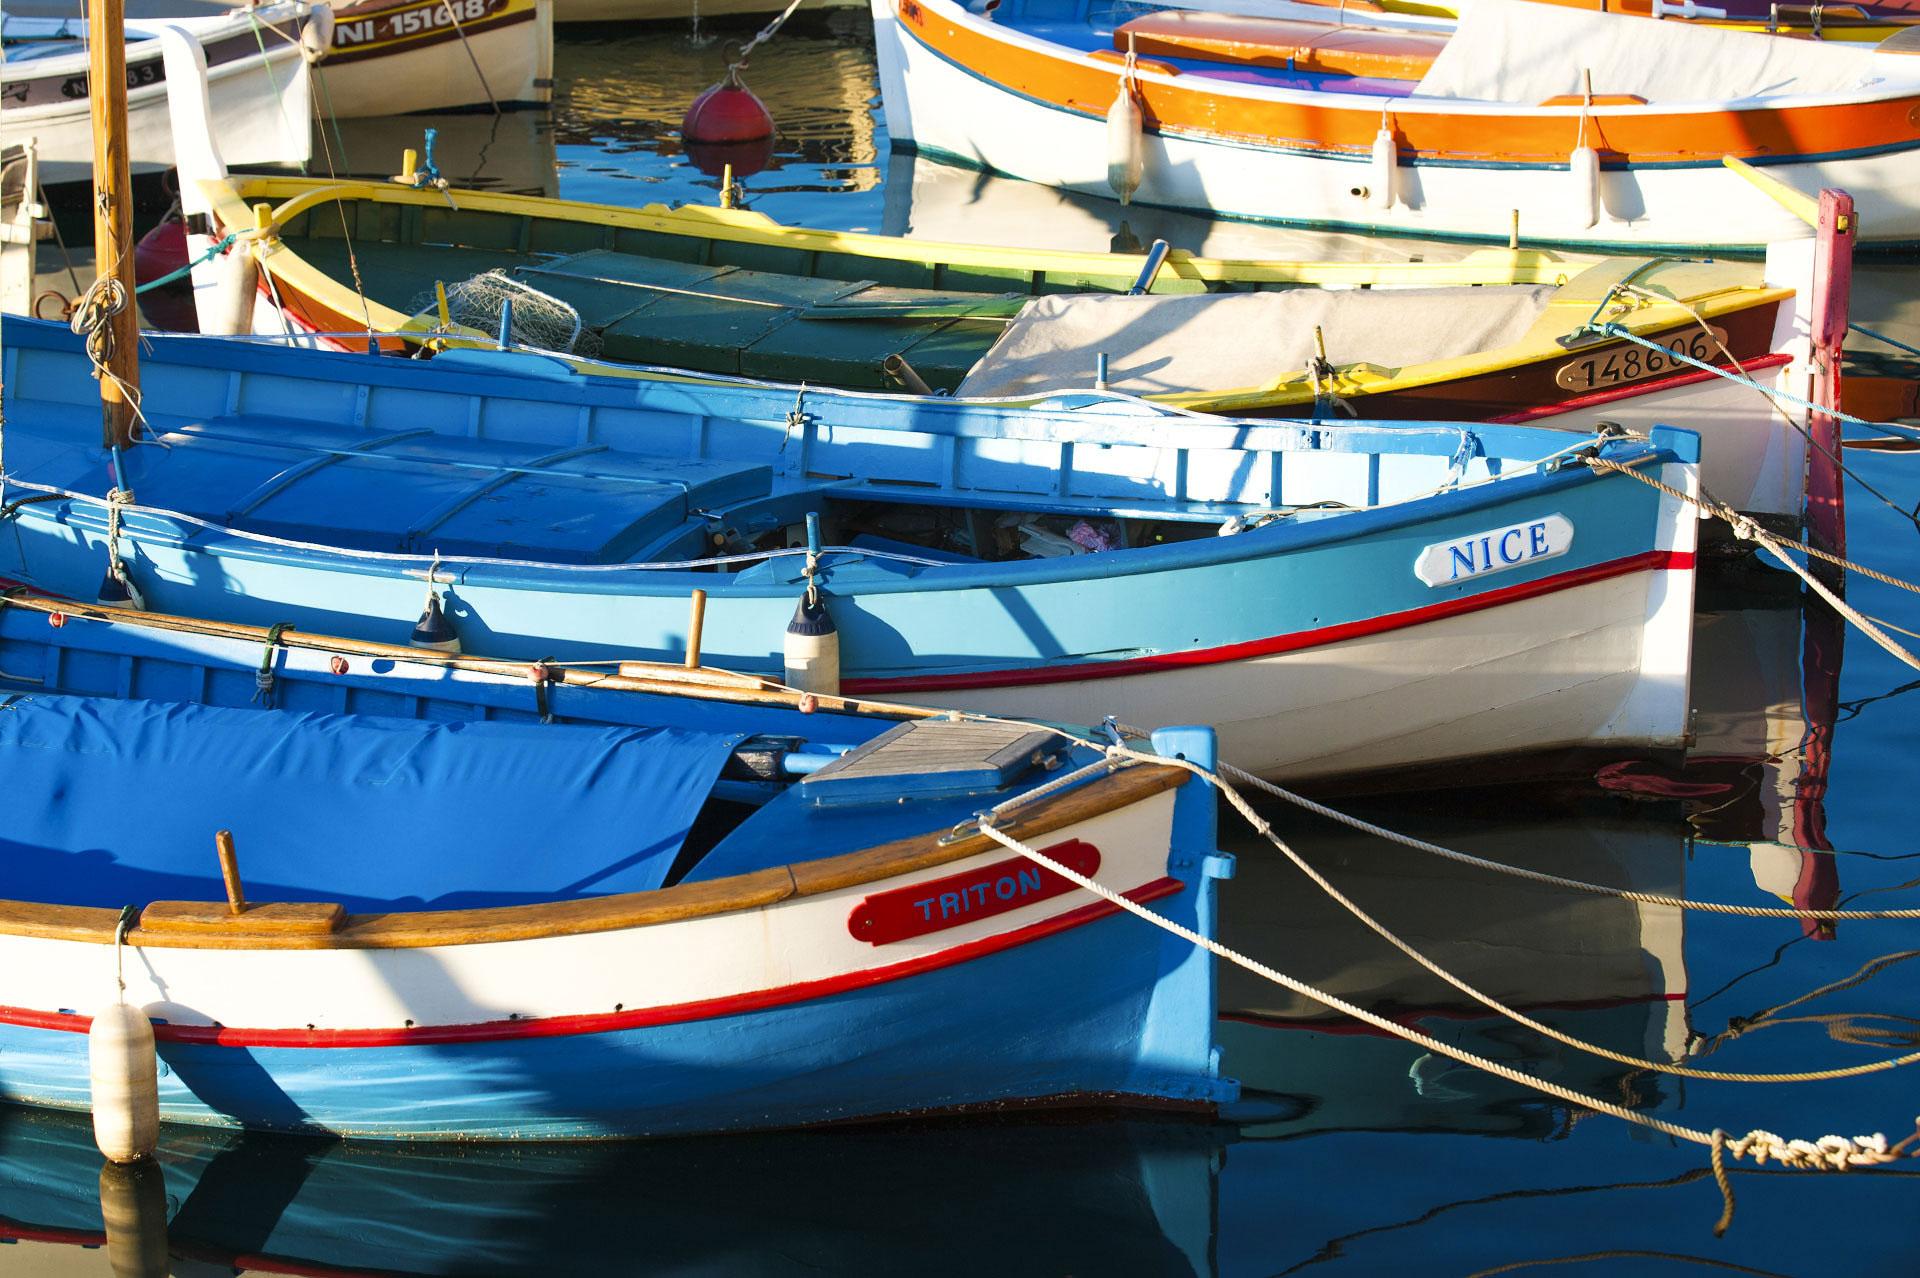 Pointus, Port de Nice. Photo Gérard Perez